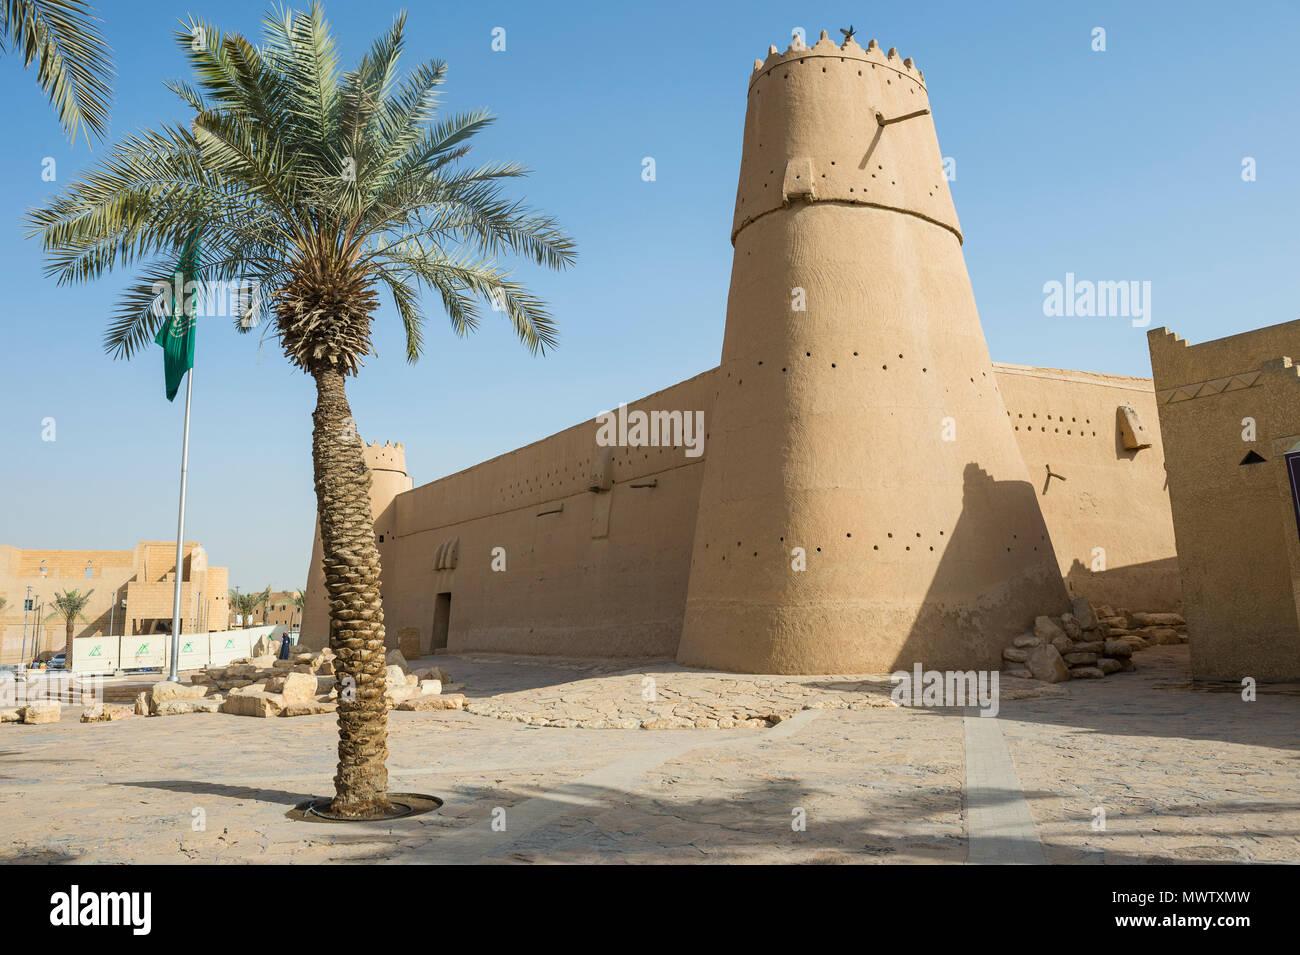 Masmak fort, Riyadh, Saudi Arabia, Middle East - Stock Image